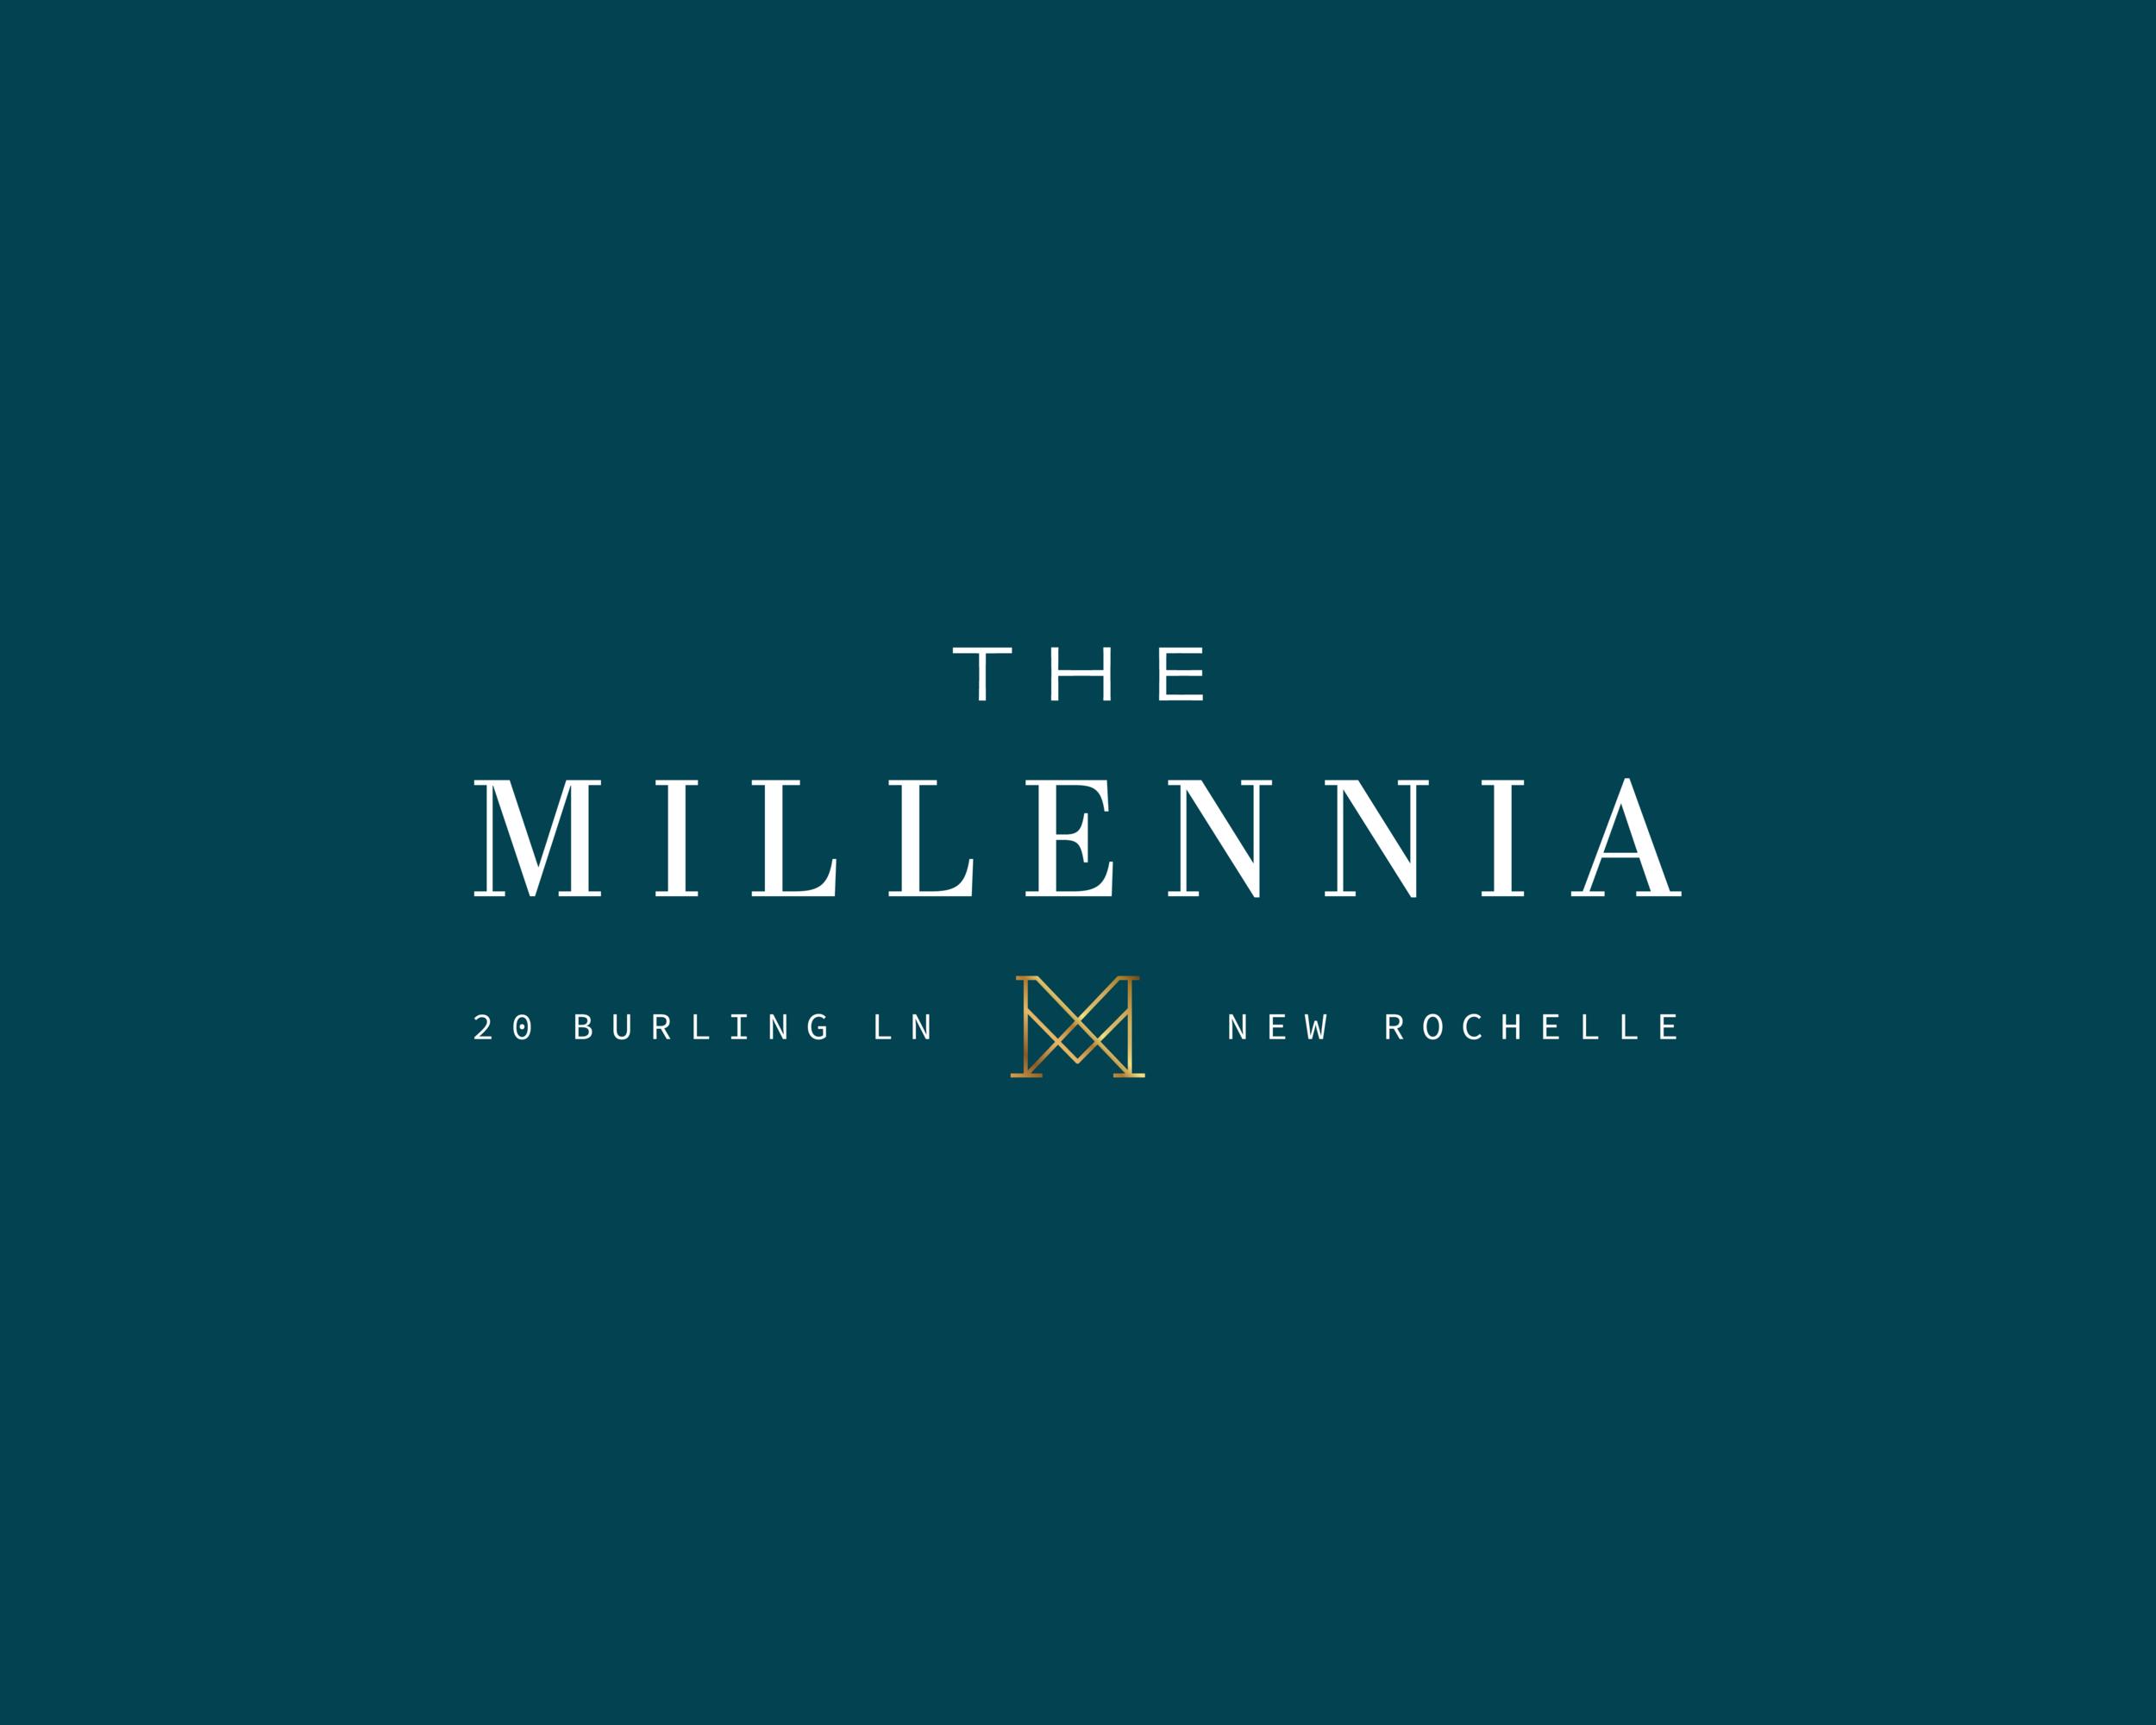 Millennia_Portfolio-01.png